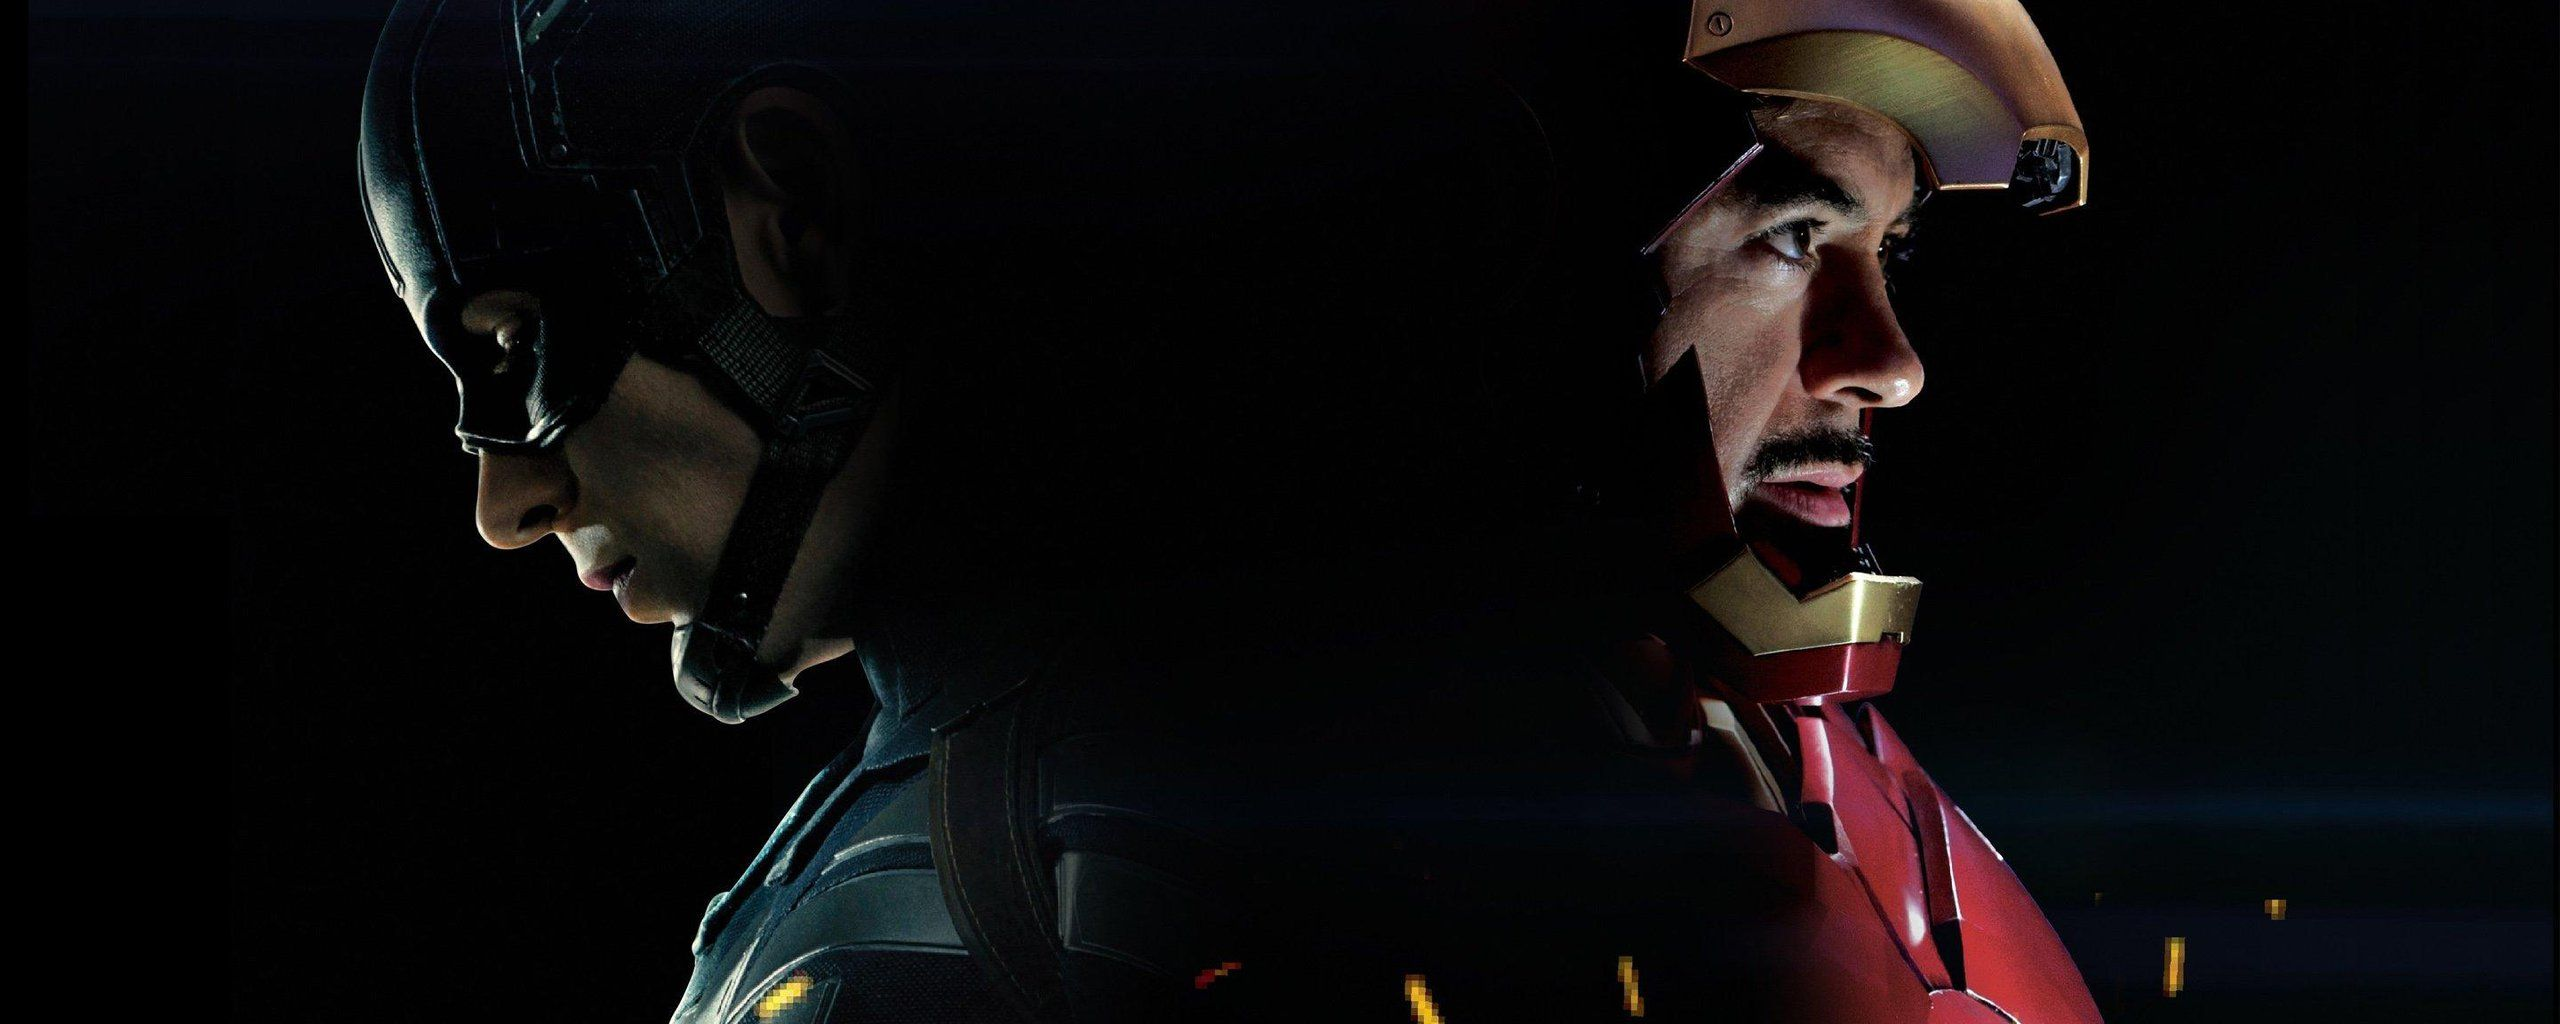 Iron Man Dual Screen Wallpapers Top Free Iron Man Dual Screen